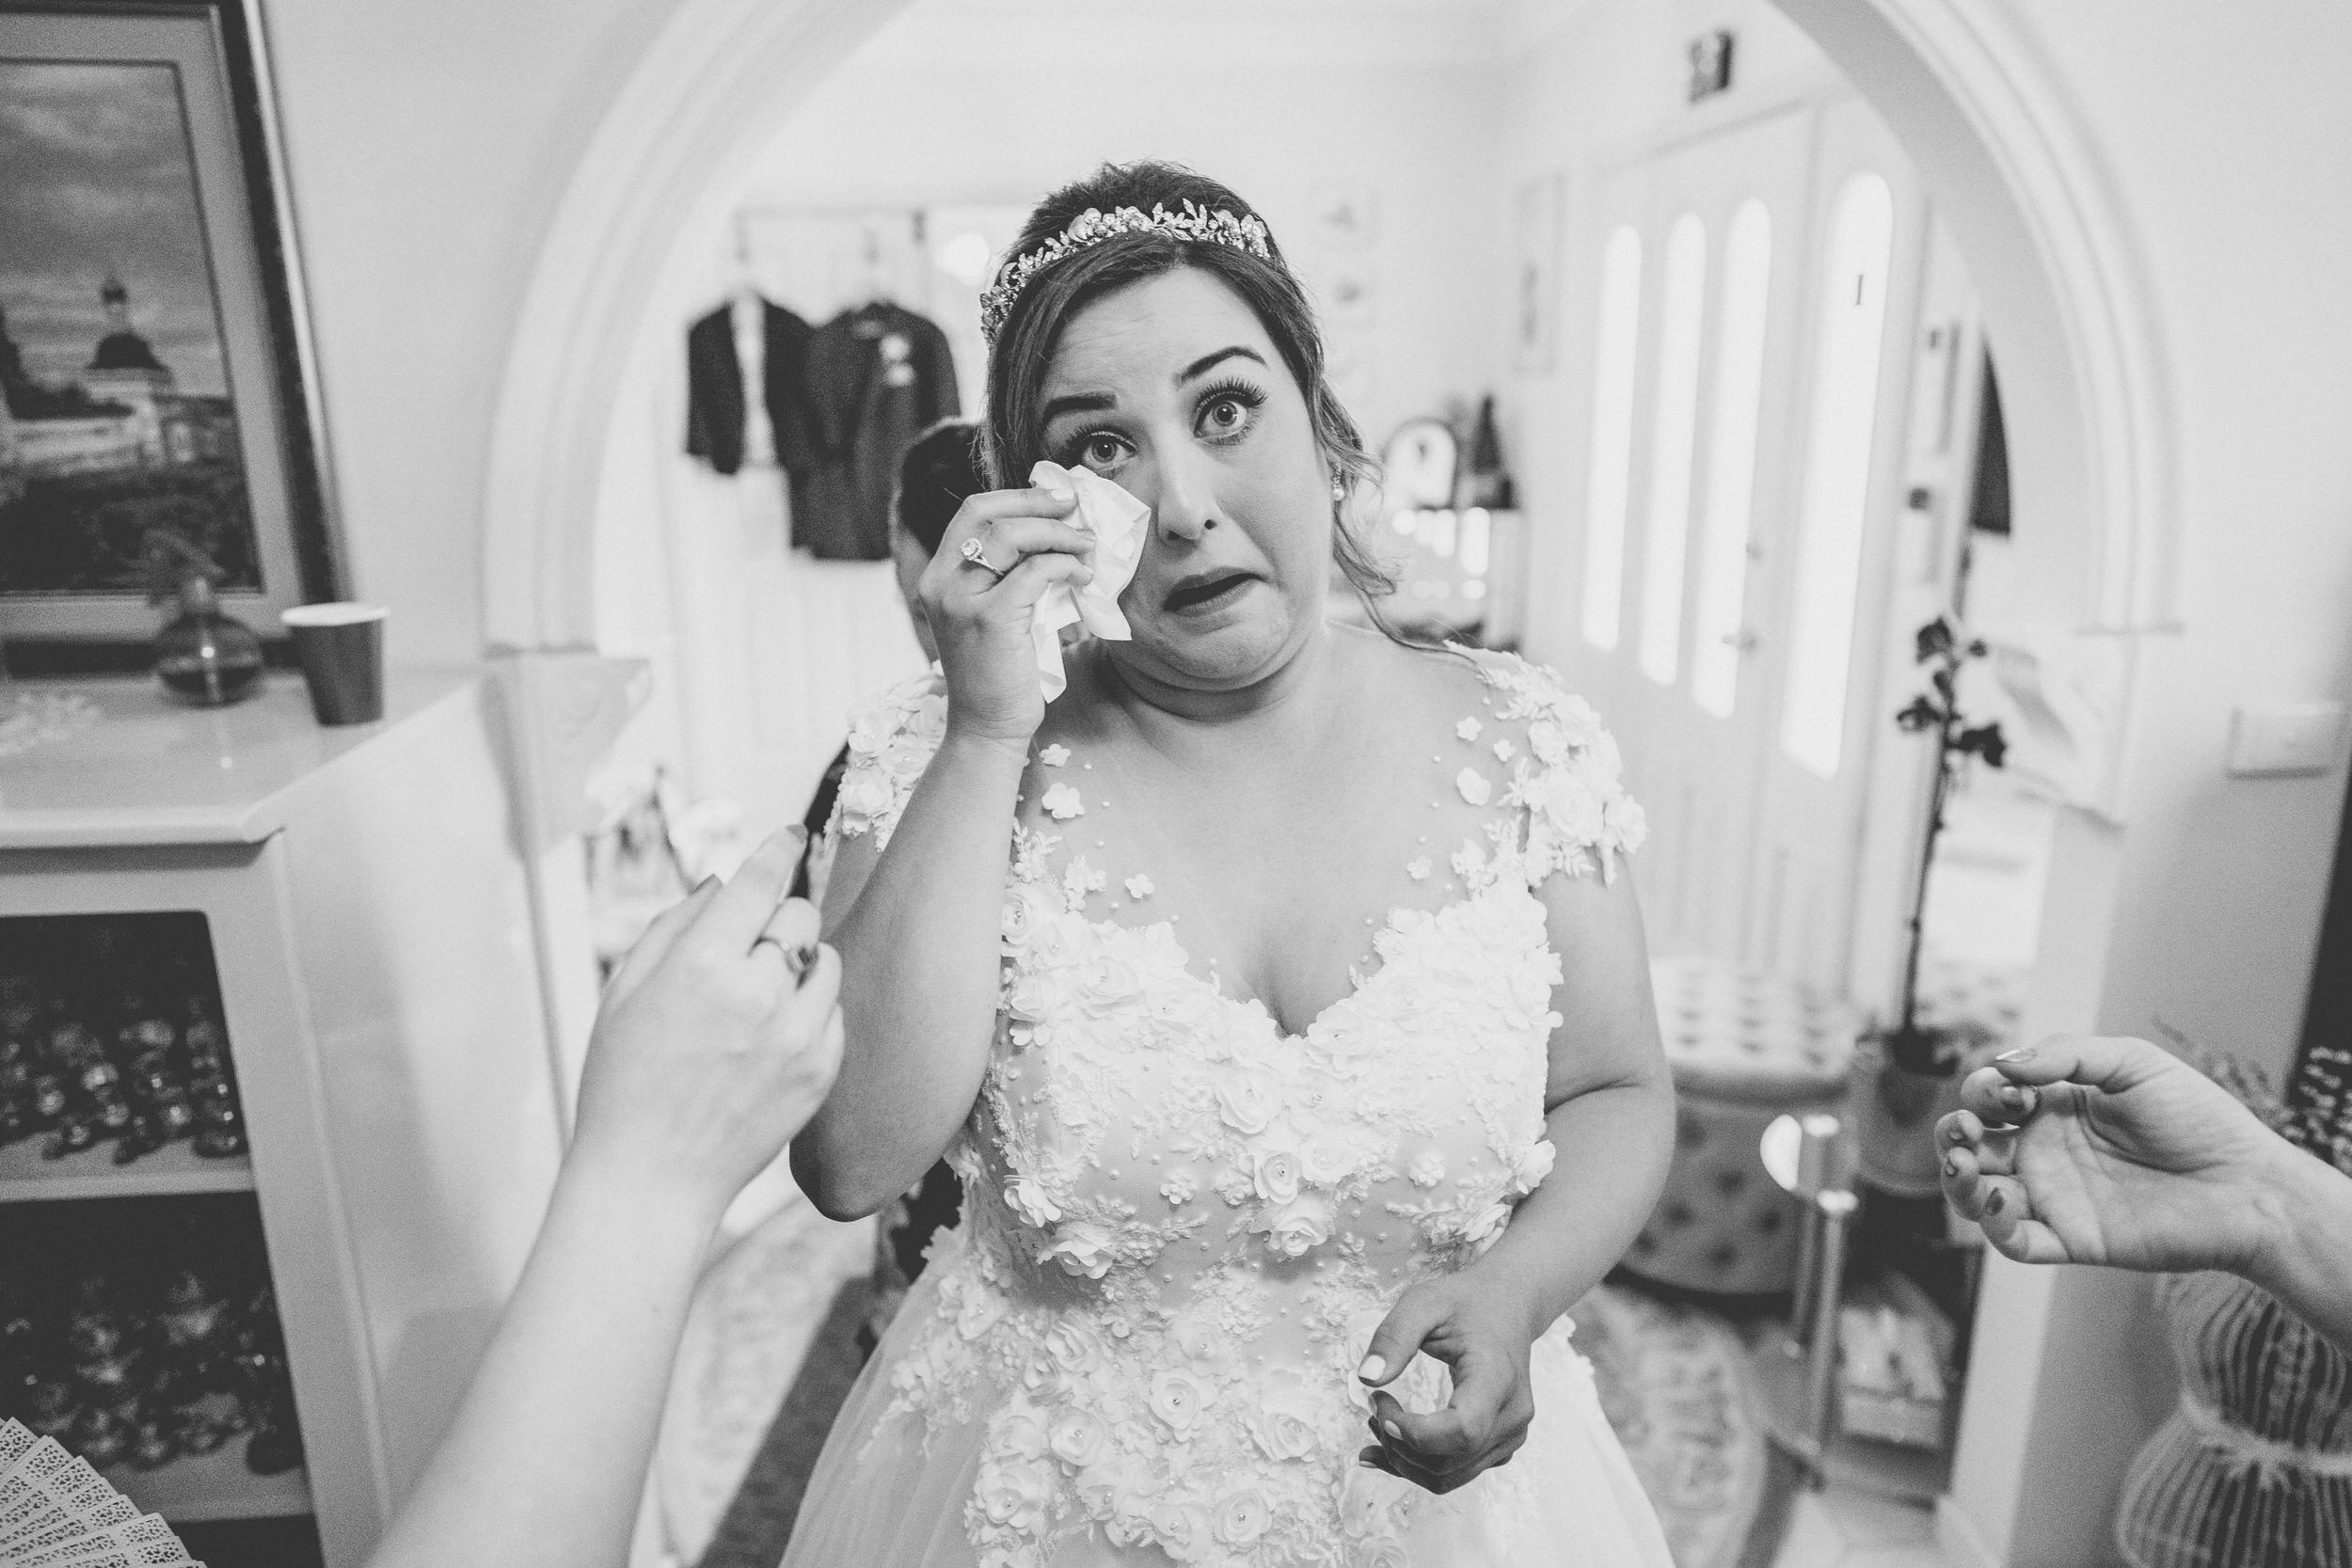 emotional bride during preparations